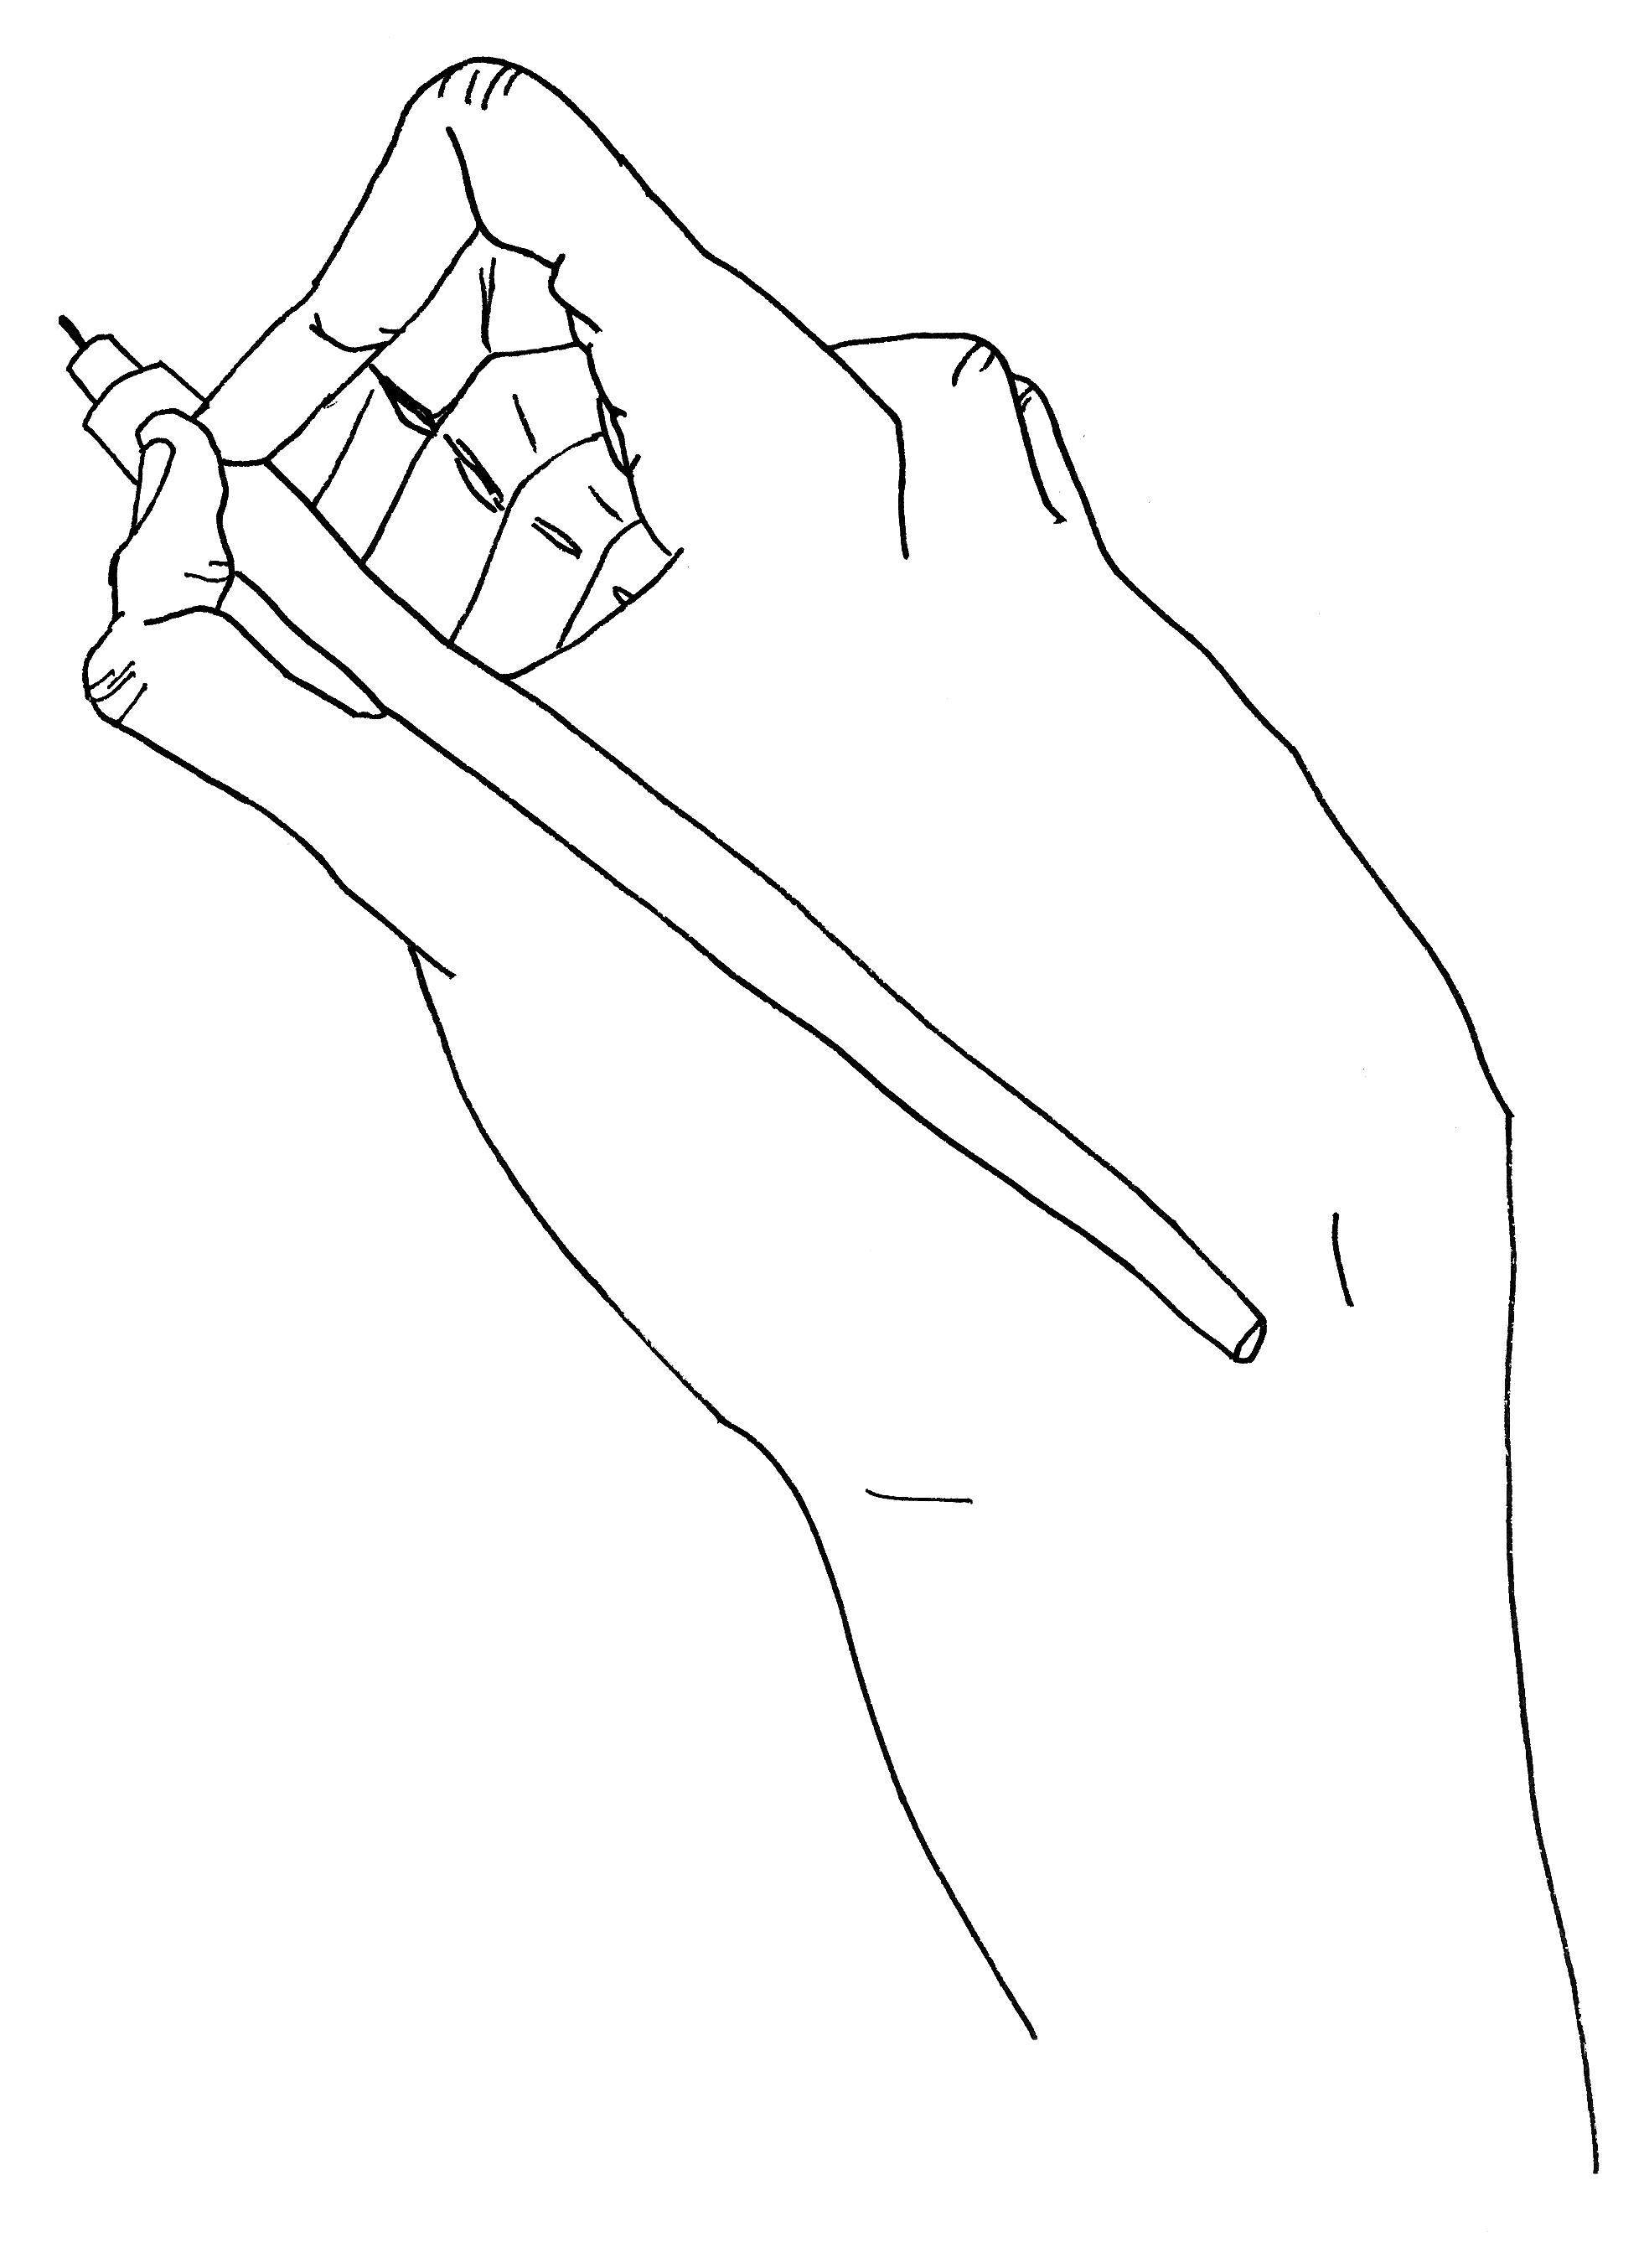 """Hand (Self Portrait)"""